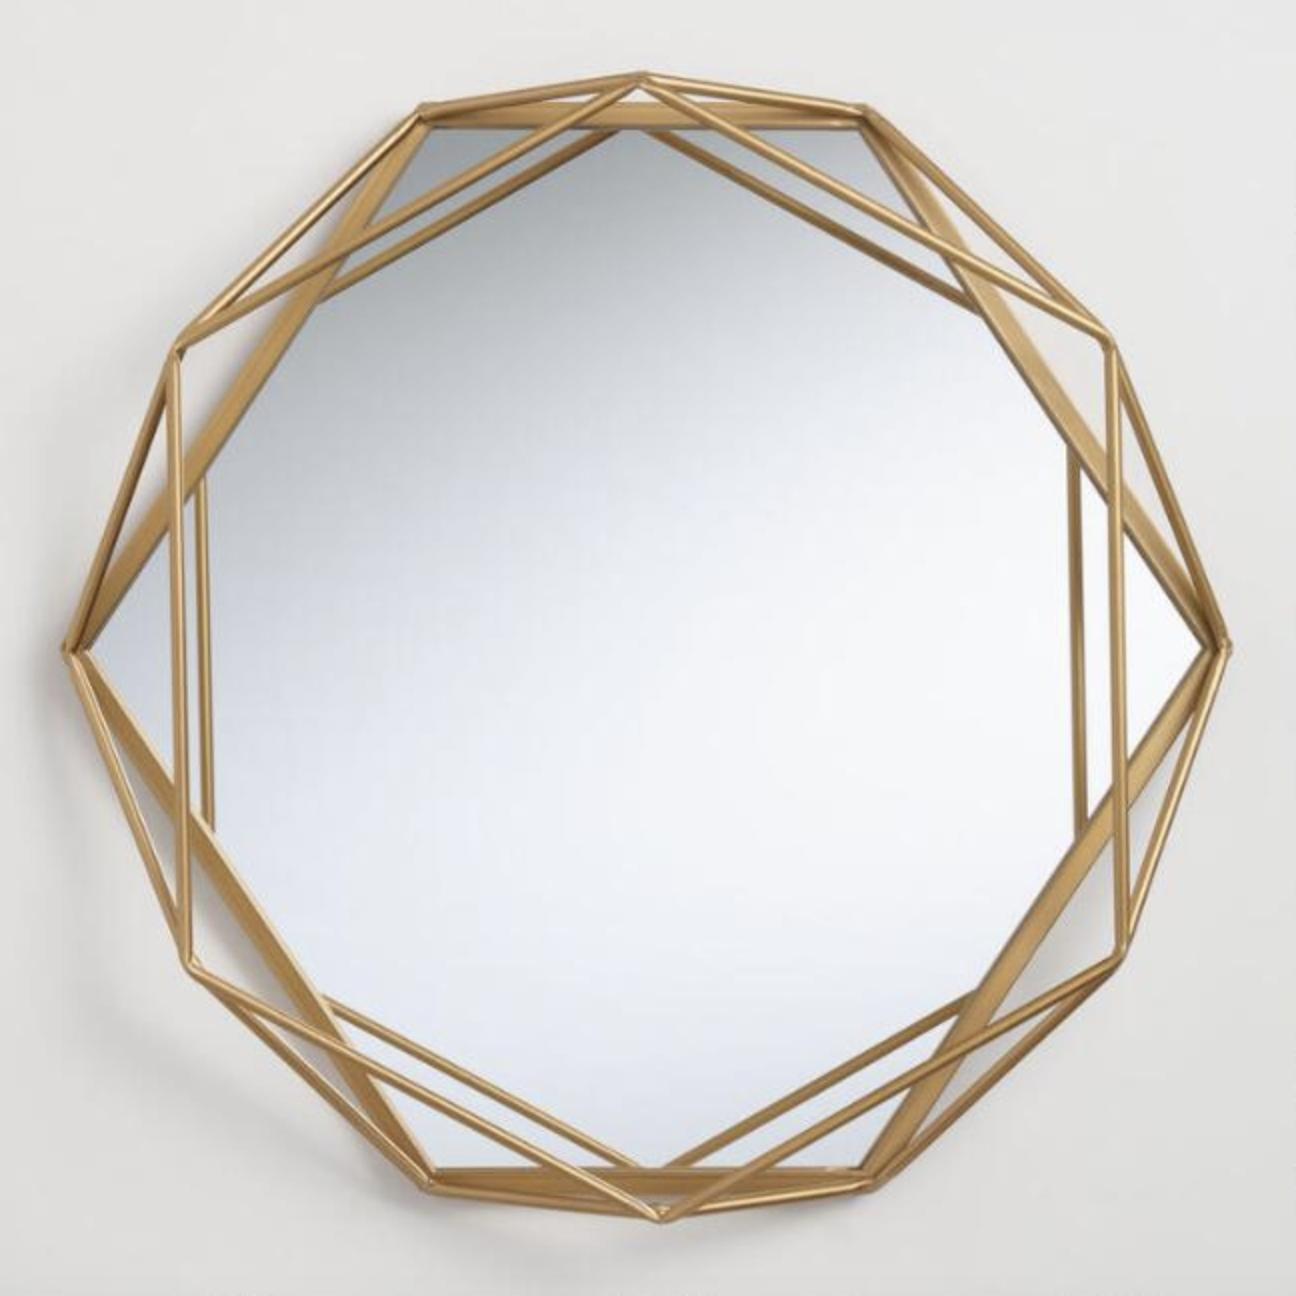 Geometric - Round gold 26